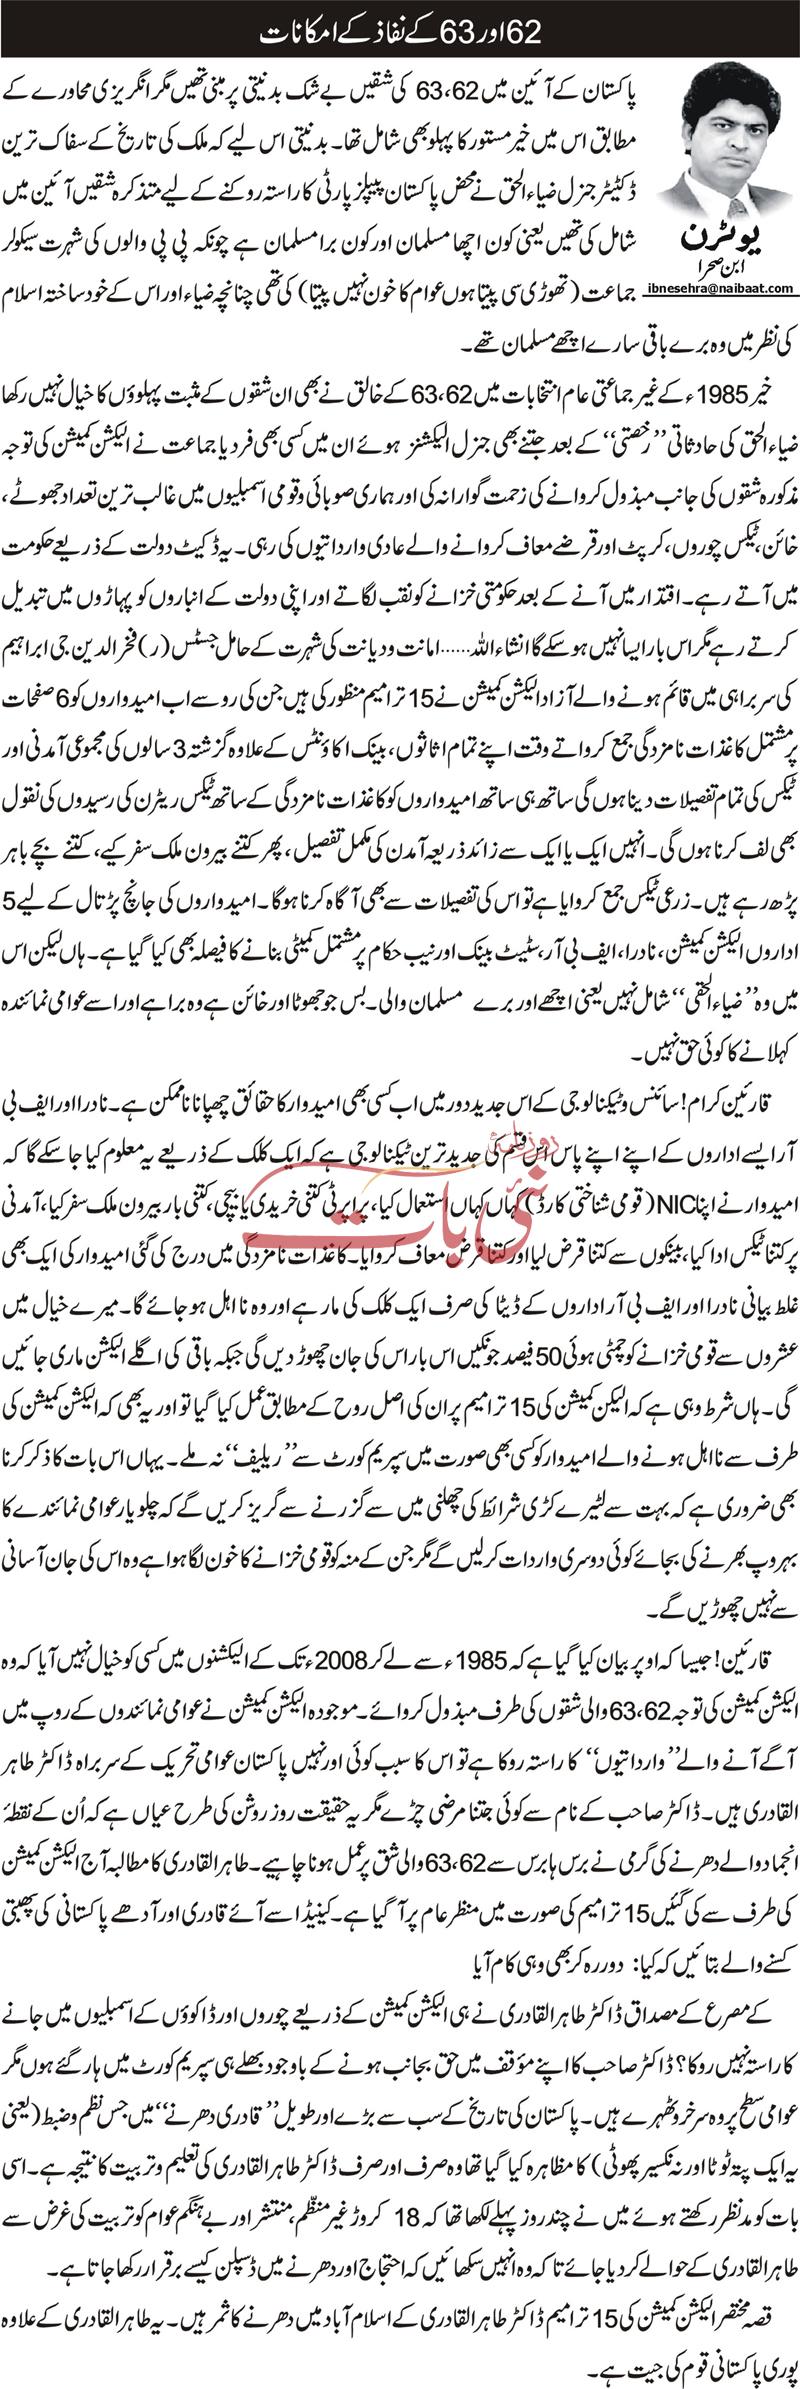 Print Media Coverage Daily Nai Baat - Ibn e Sehra